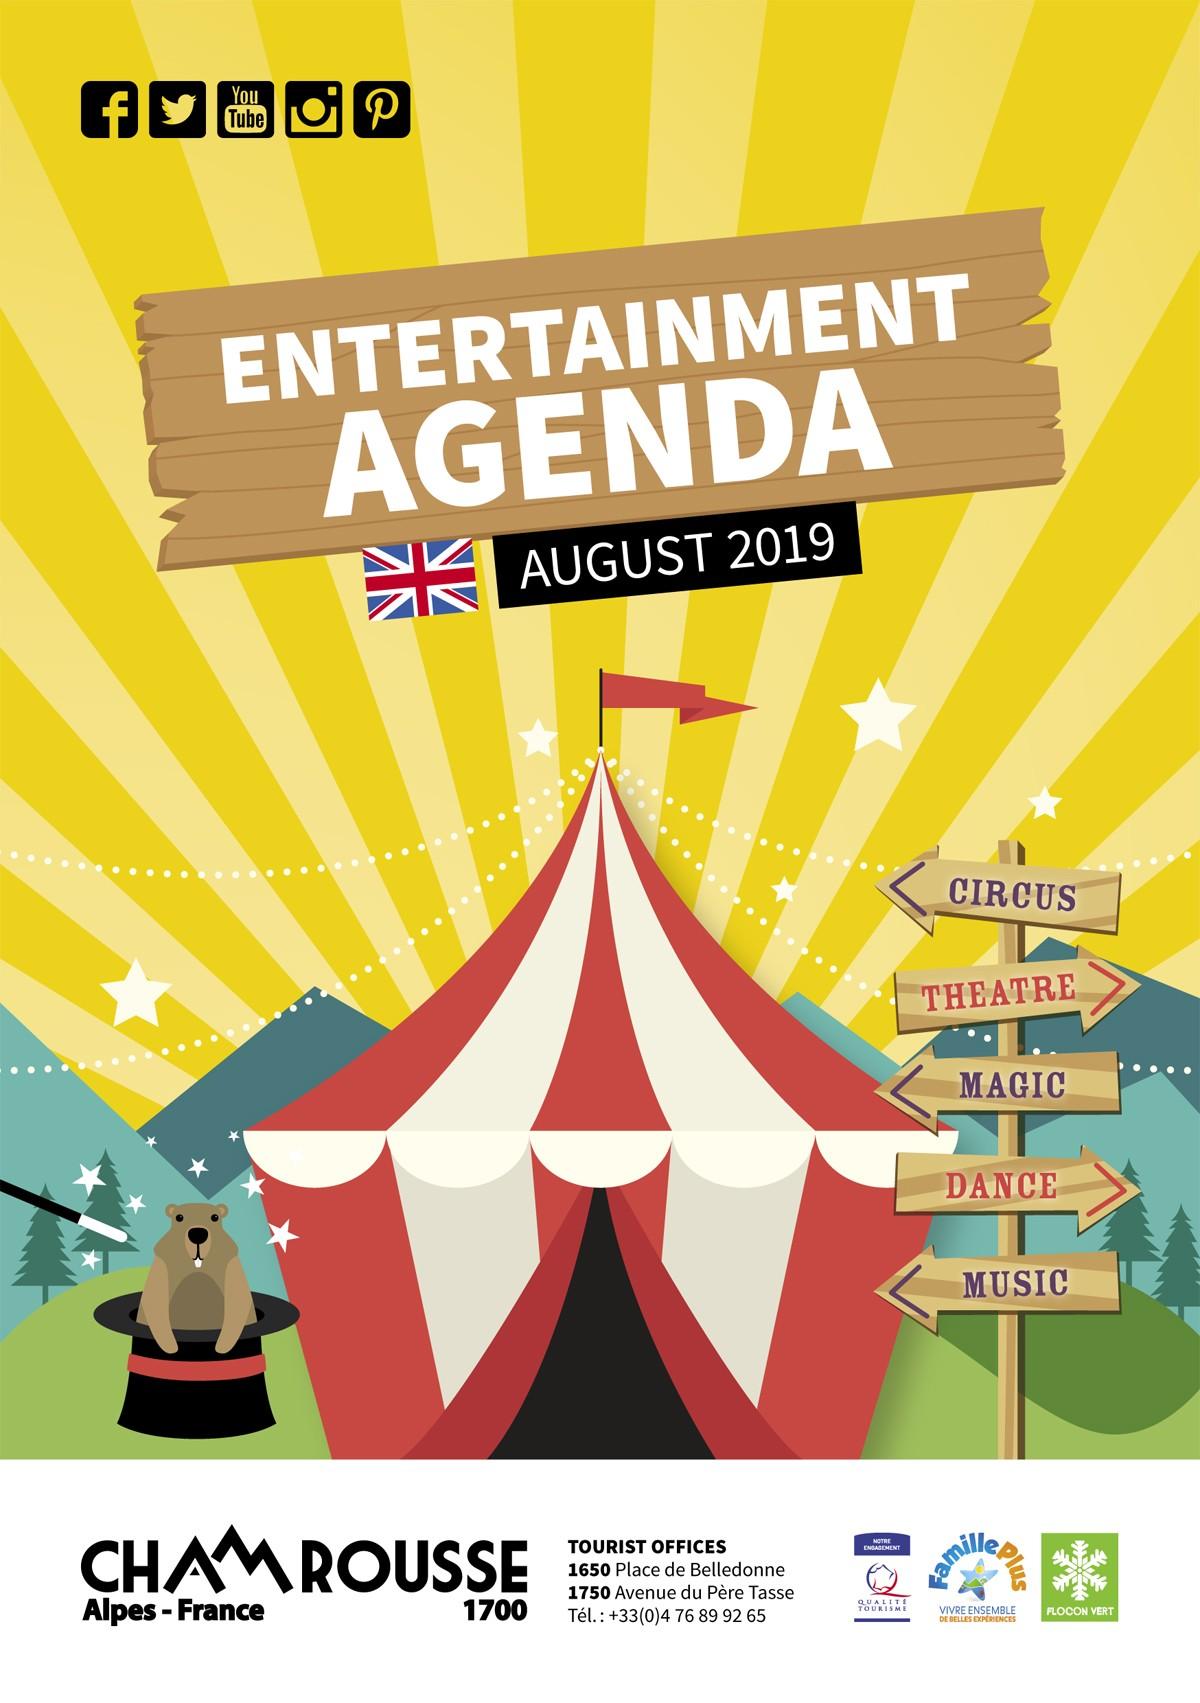 Chamrousse entertainment programme August 2019